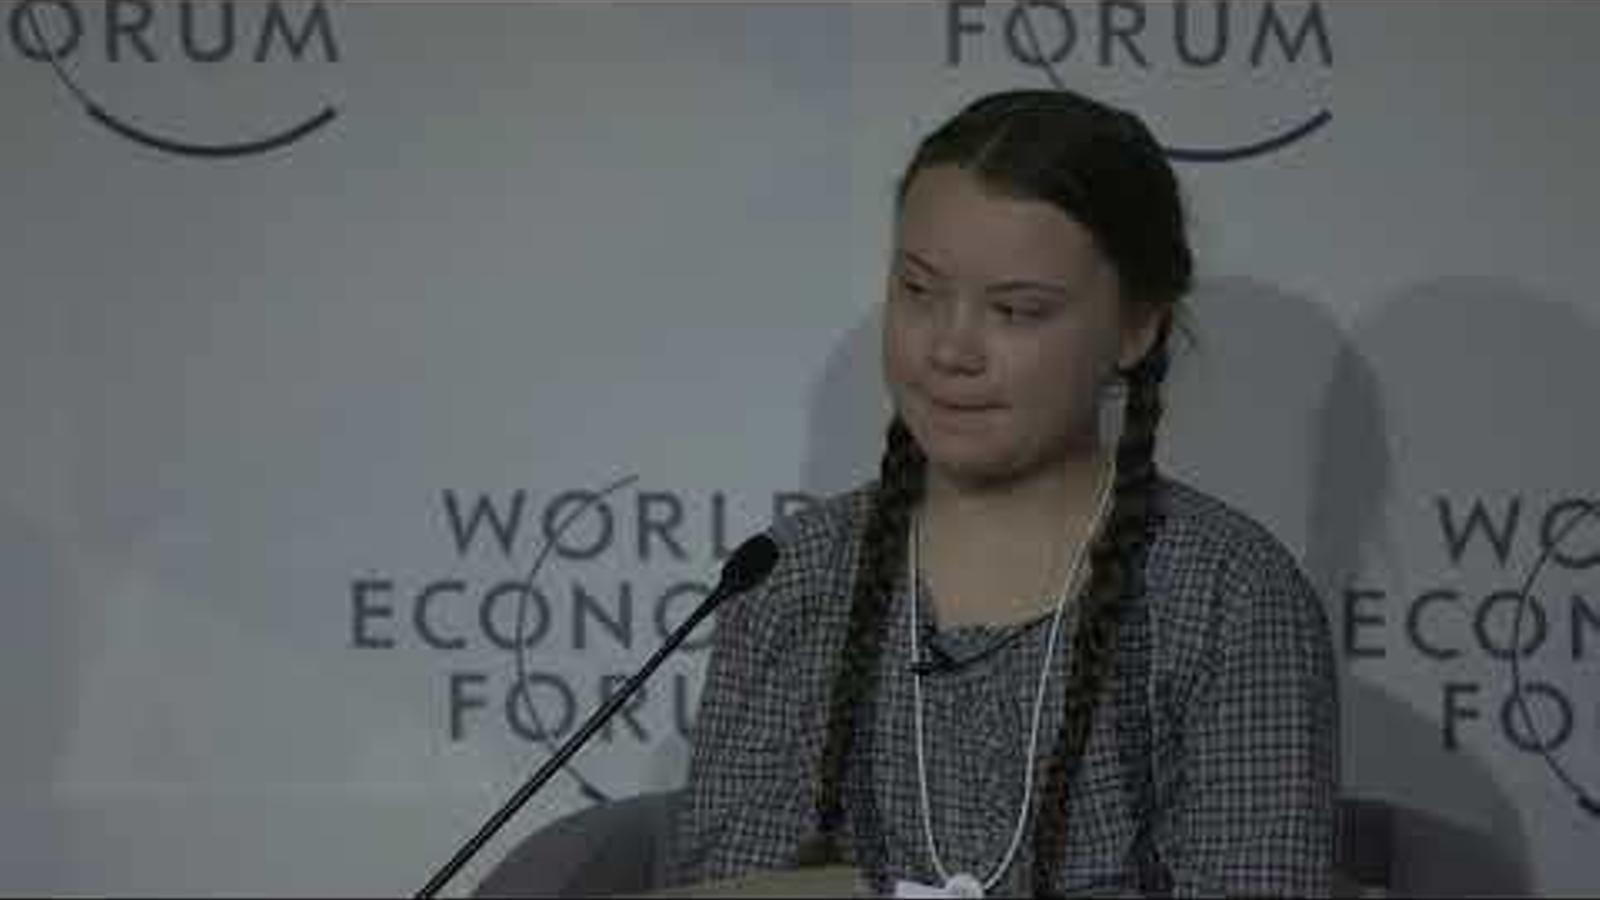 Greta Thunberg fa un discurs al Forum Econòmic Mundial de Davos